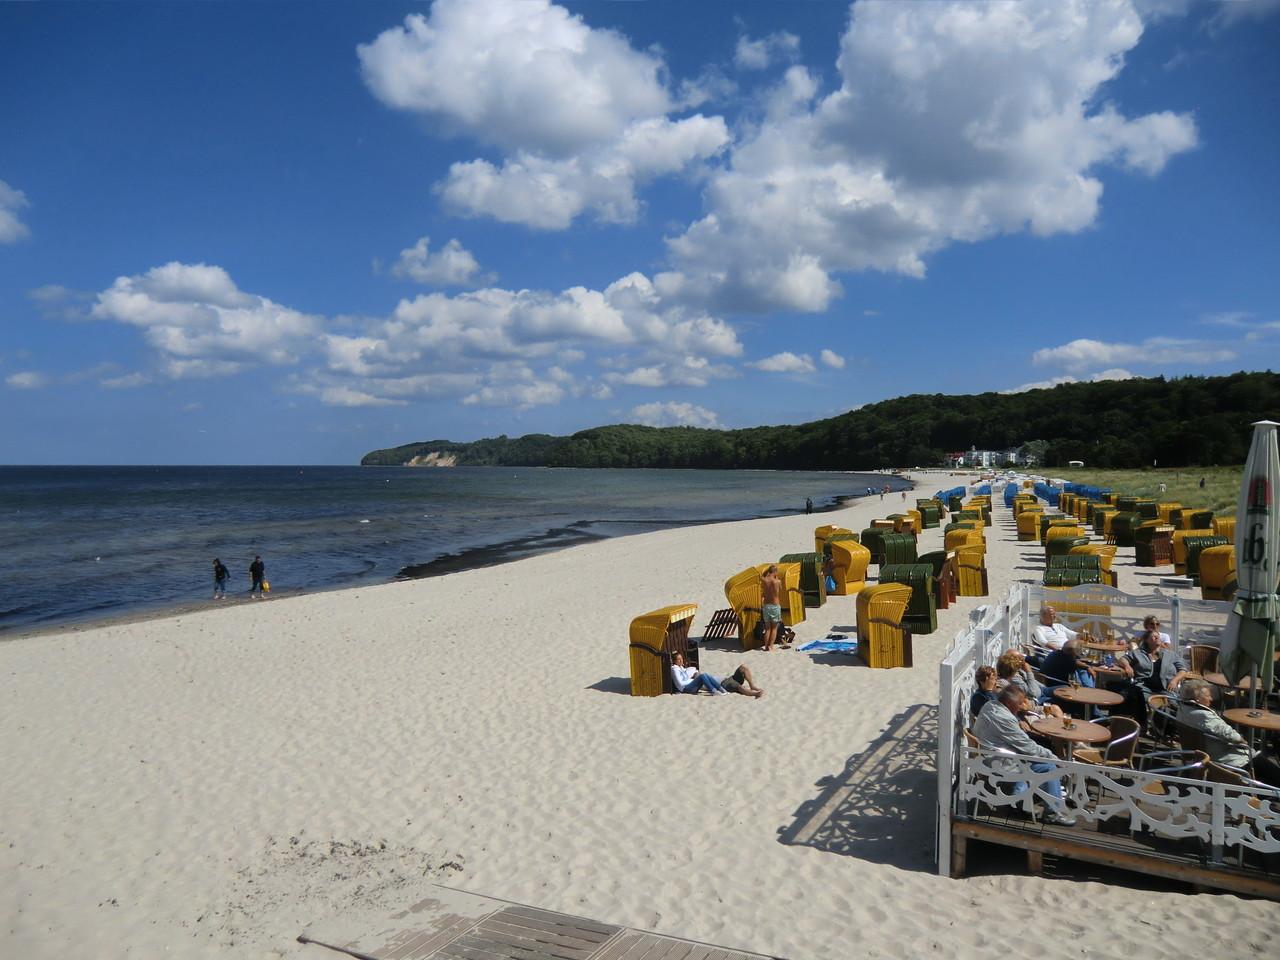 Strandabschnitt in Binz